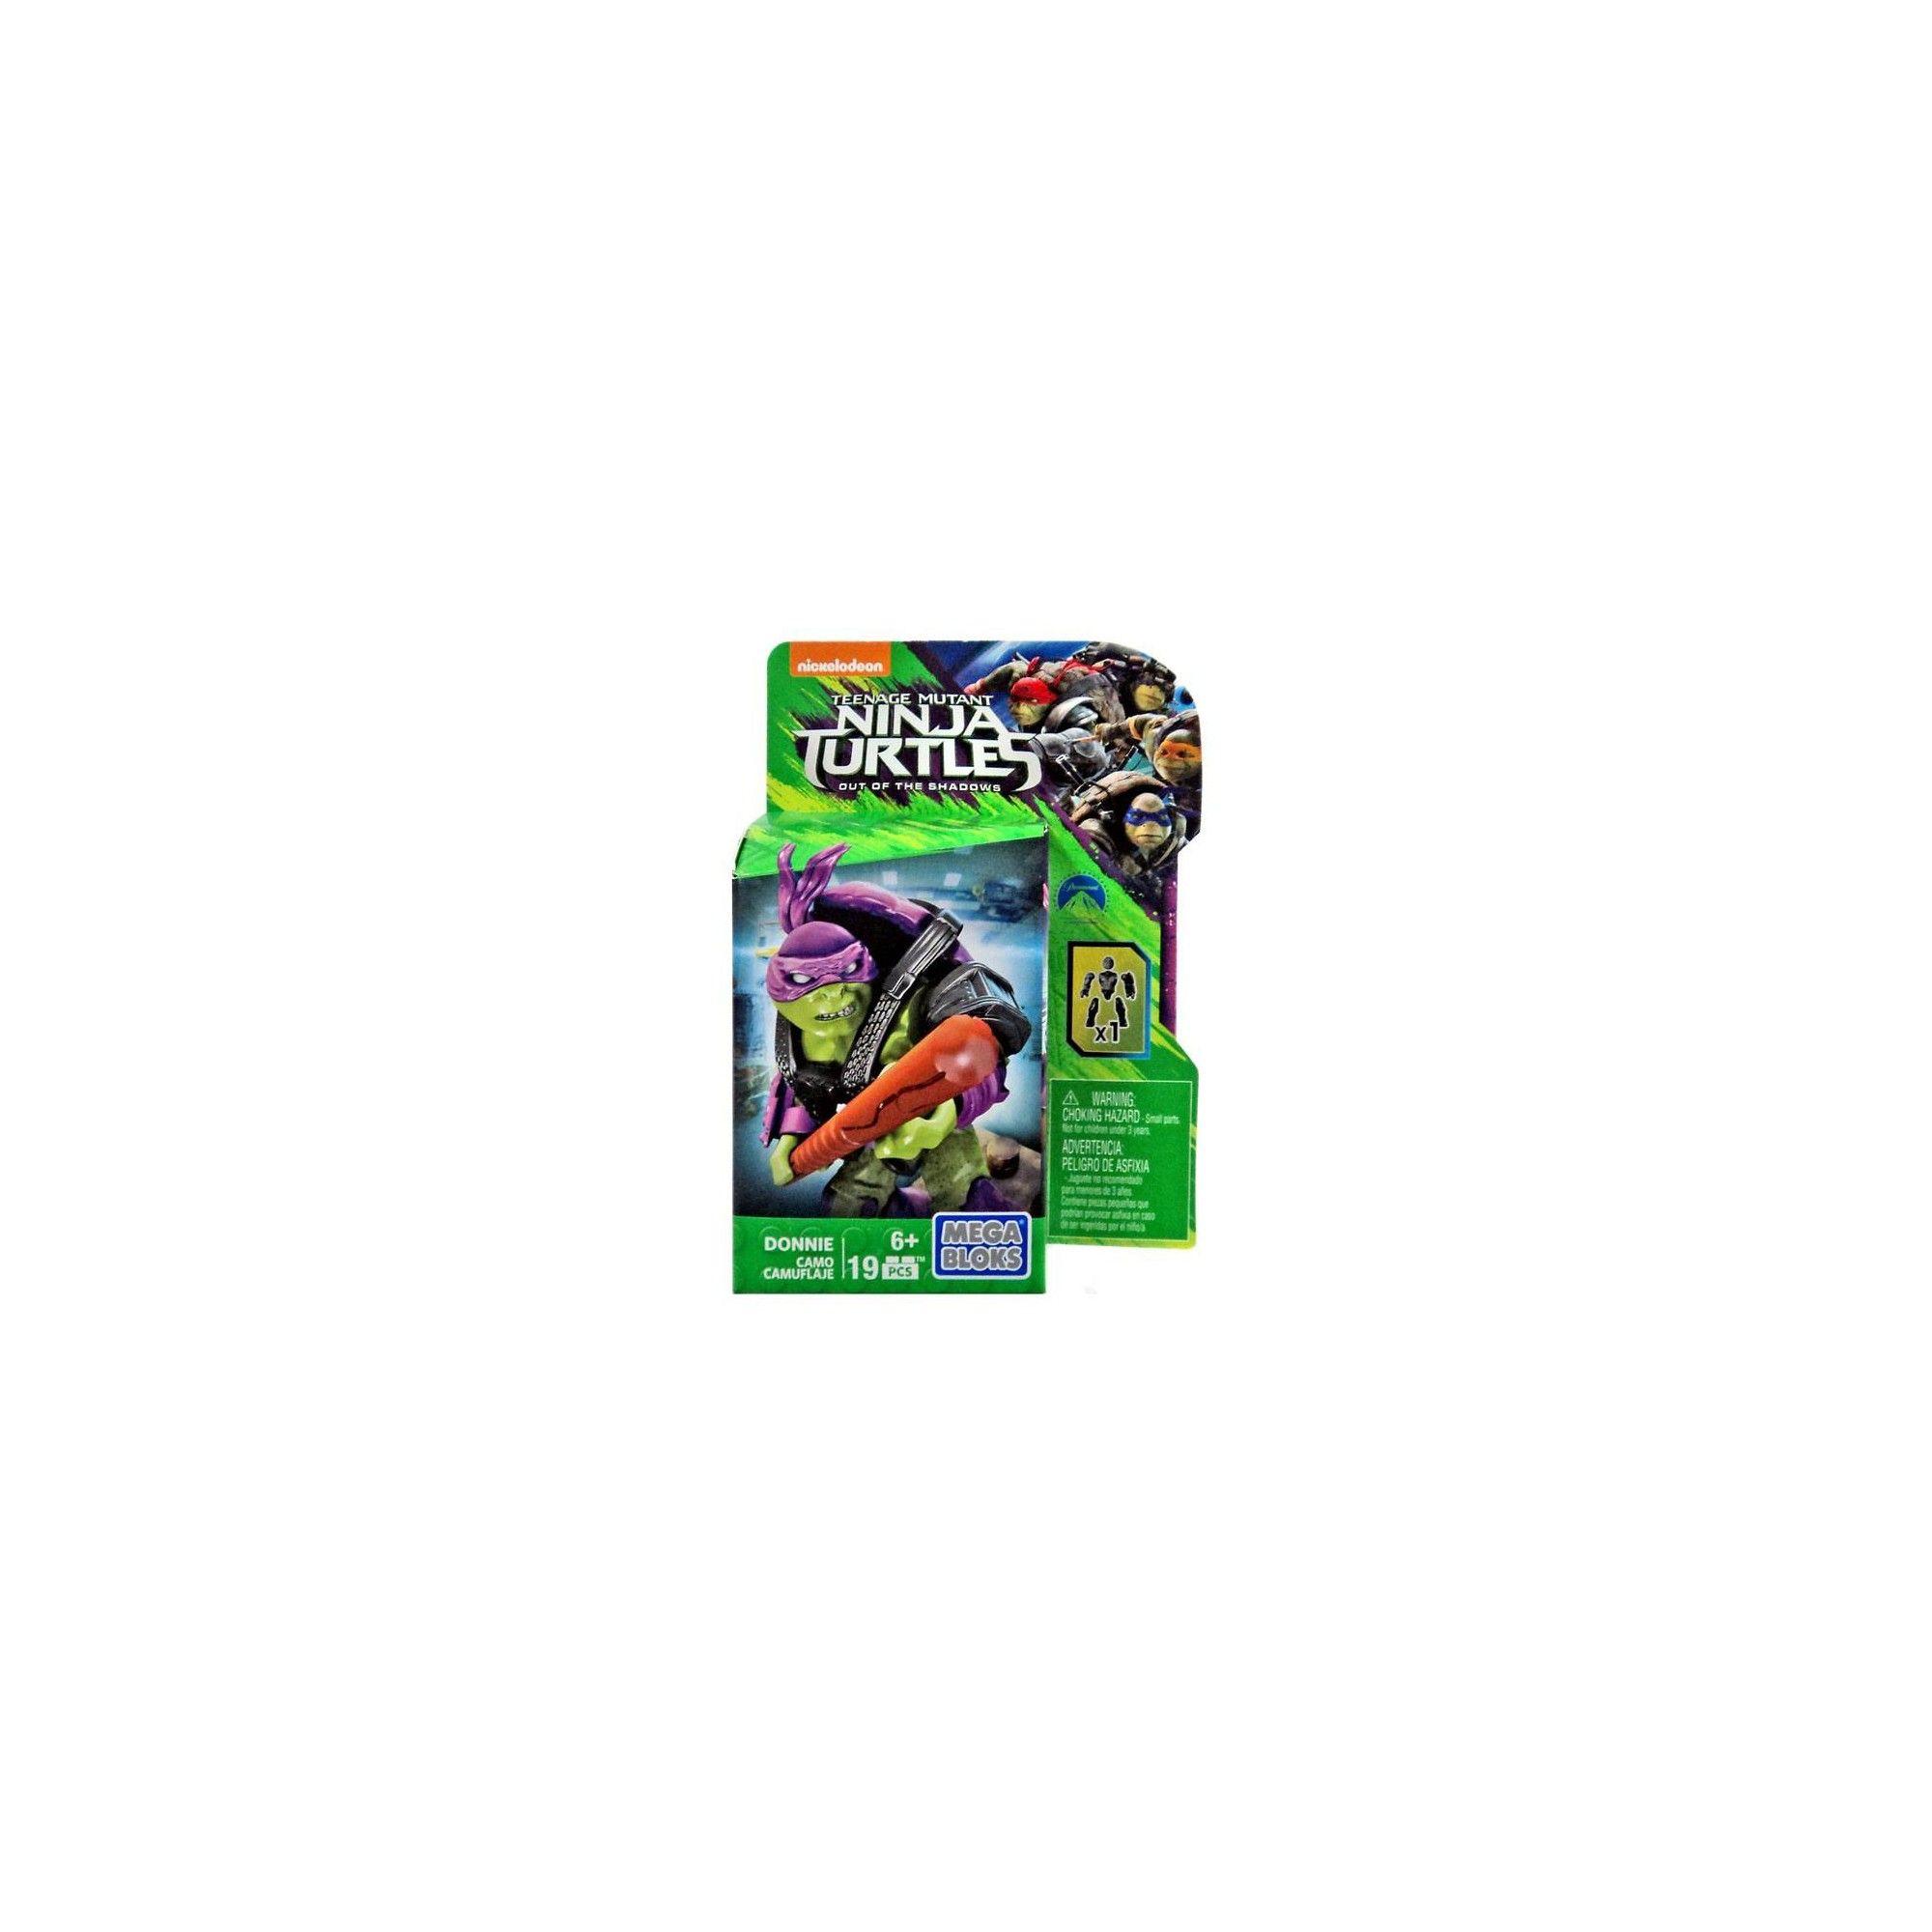 Camo Teenage Mutant Ninja Turtles Out of the Shadows Donnie Set DPW18